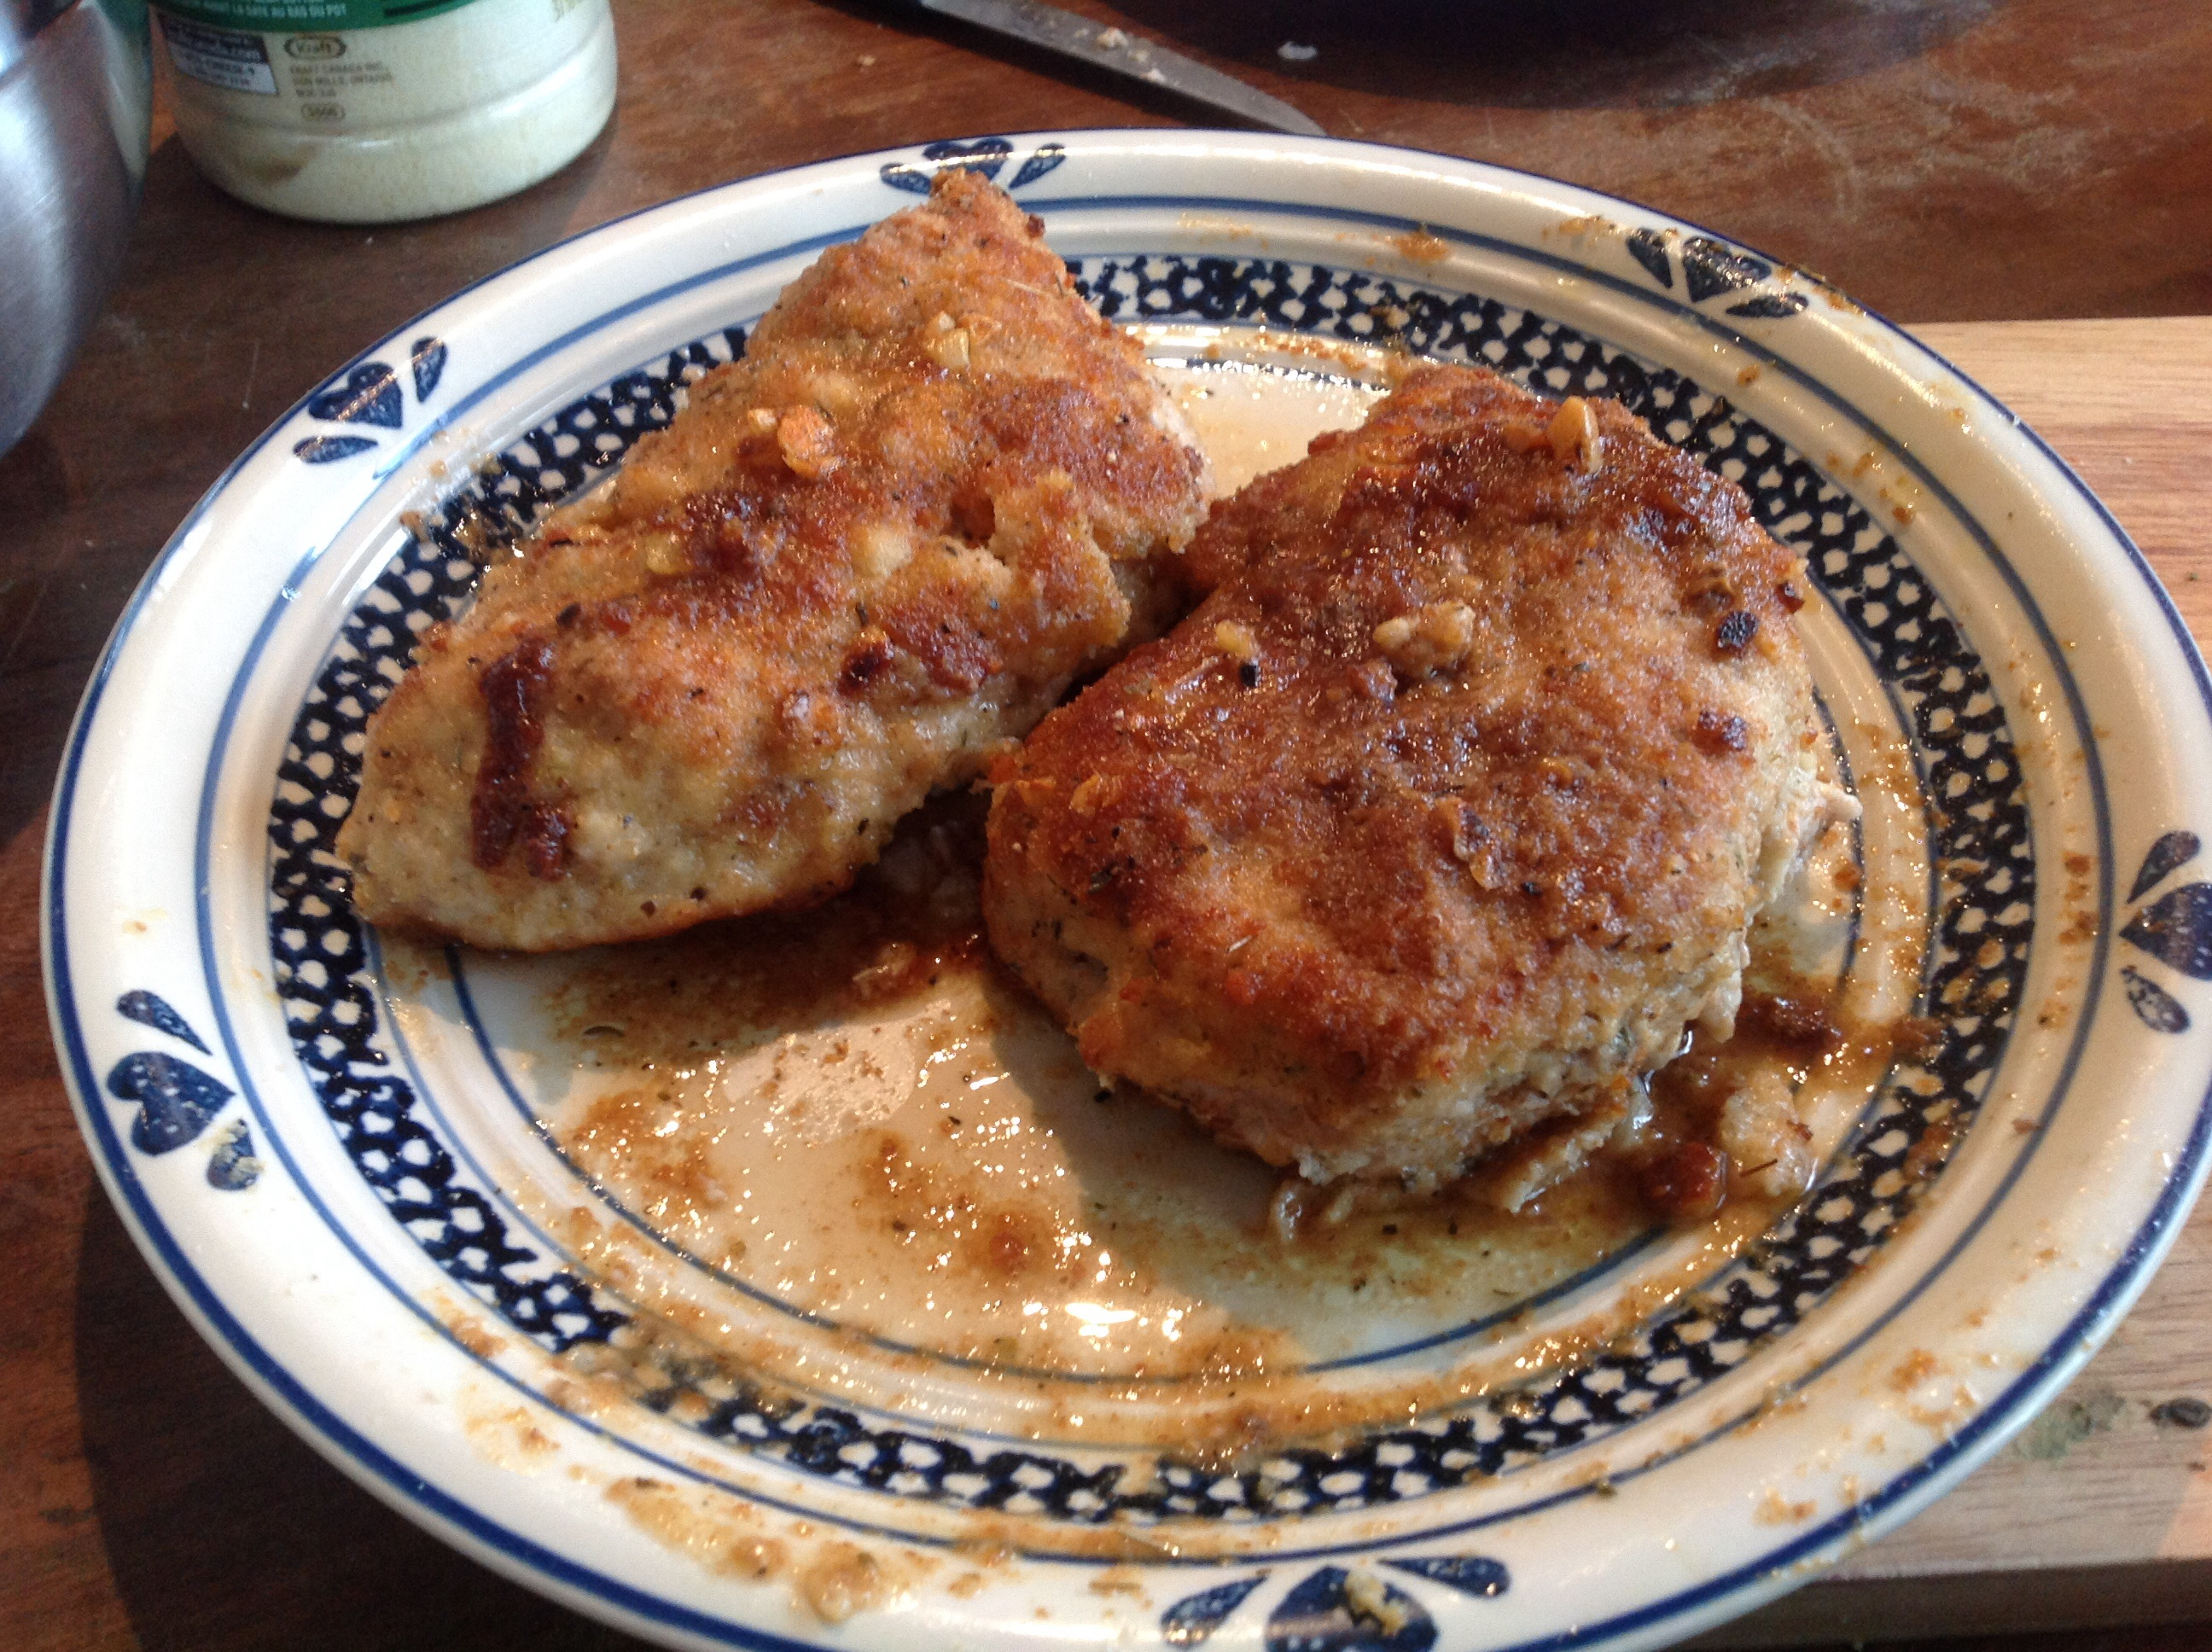 Italian Breaded Pork Chops Jacqueline